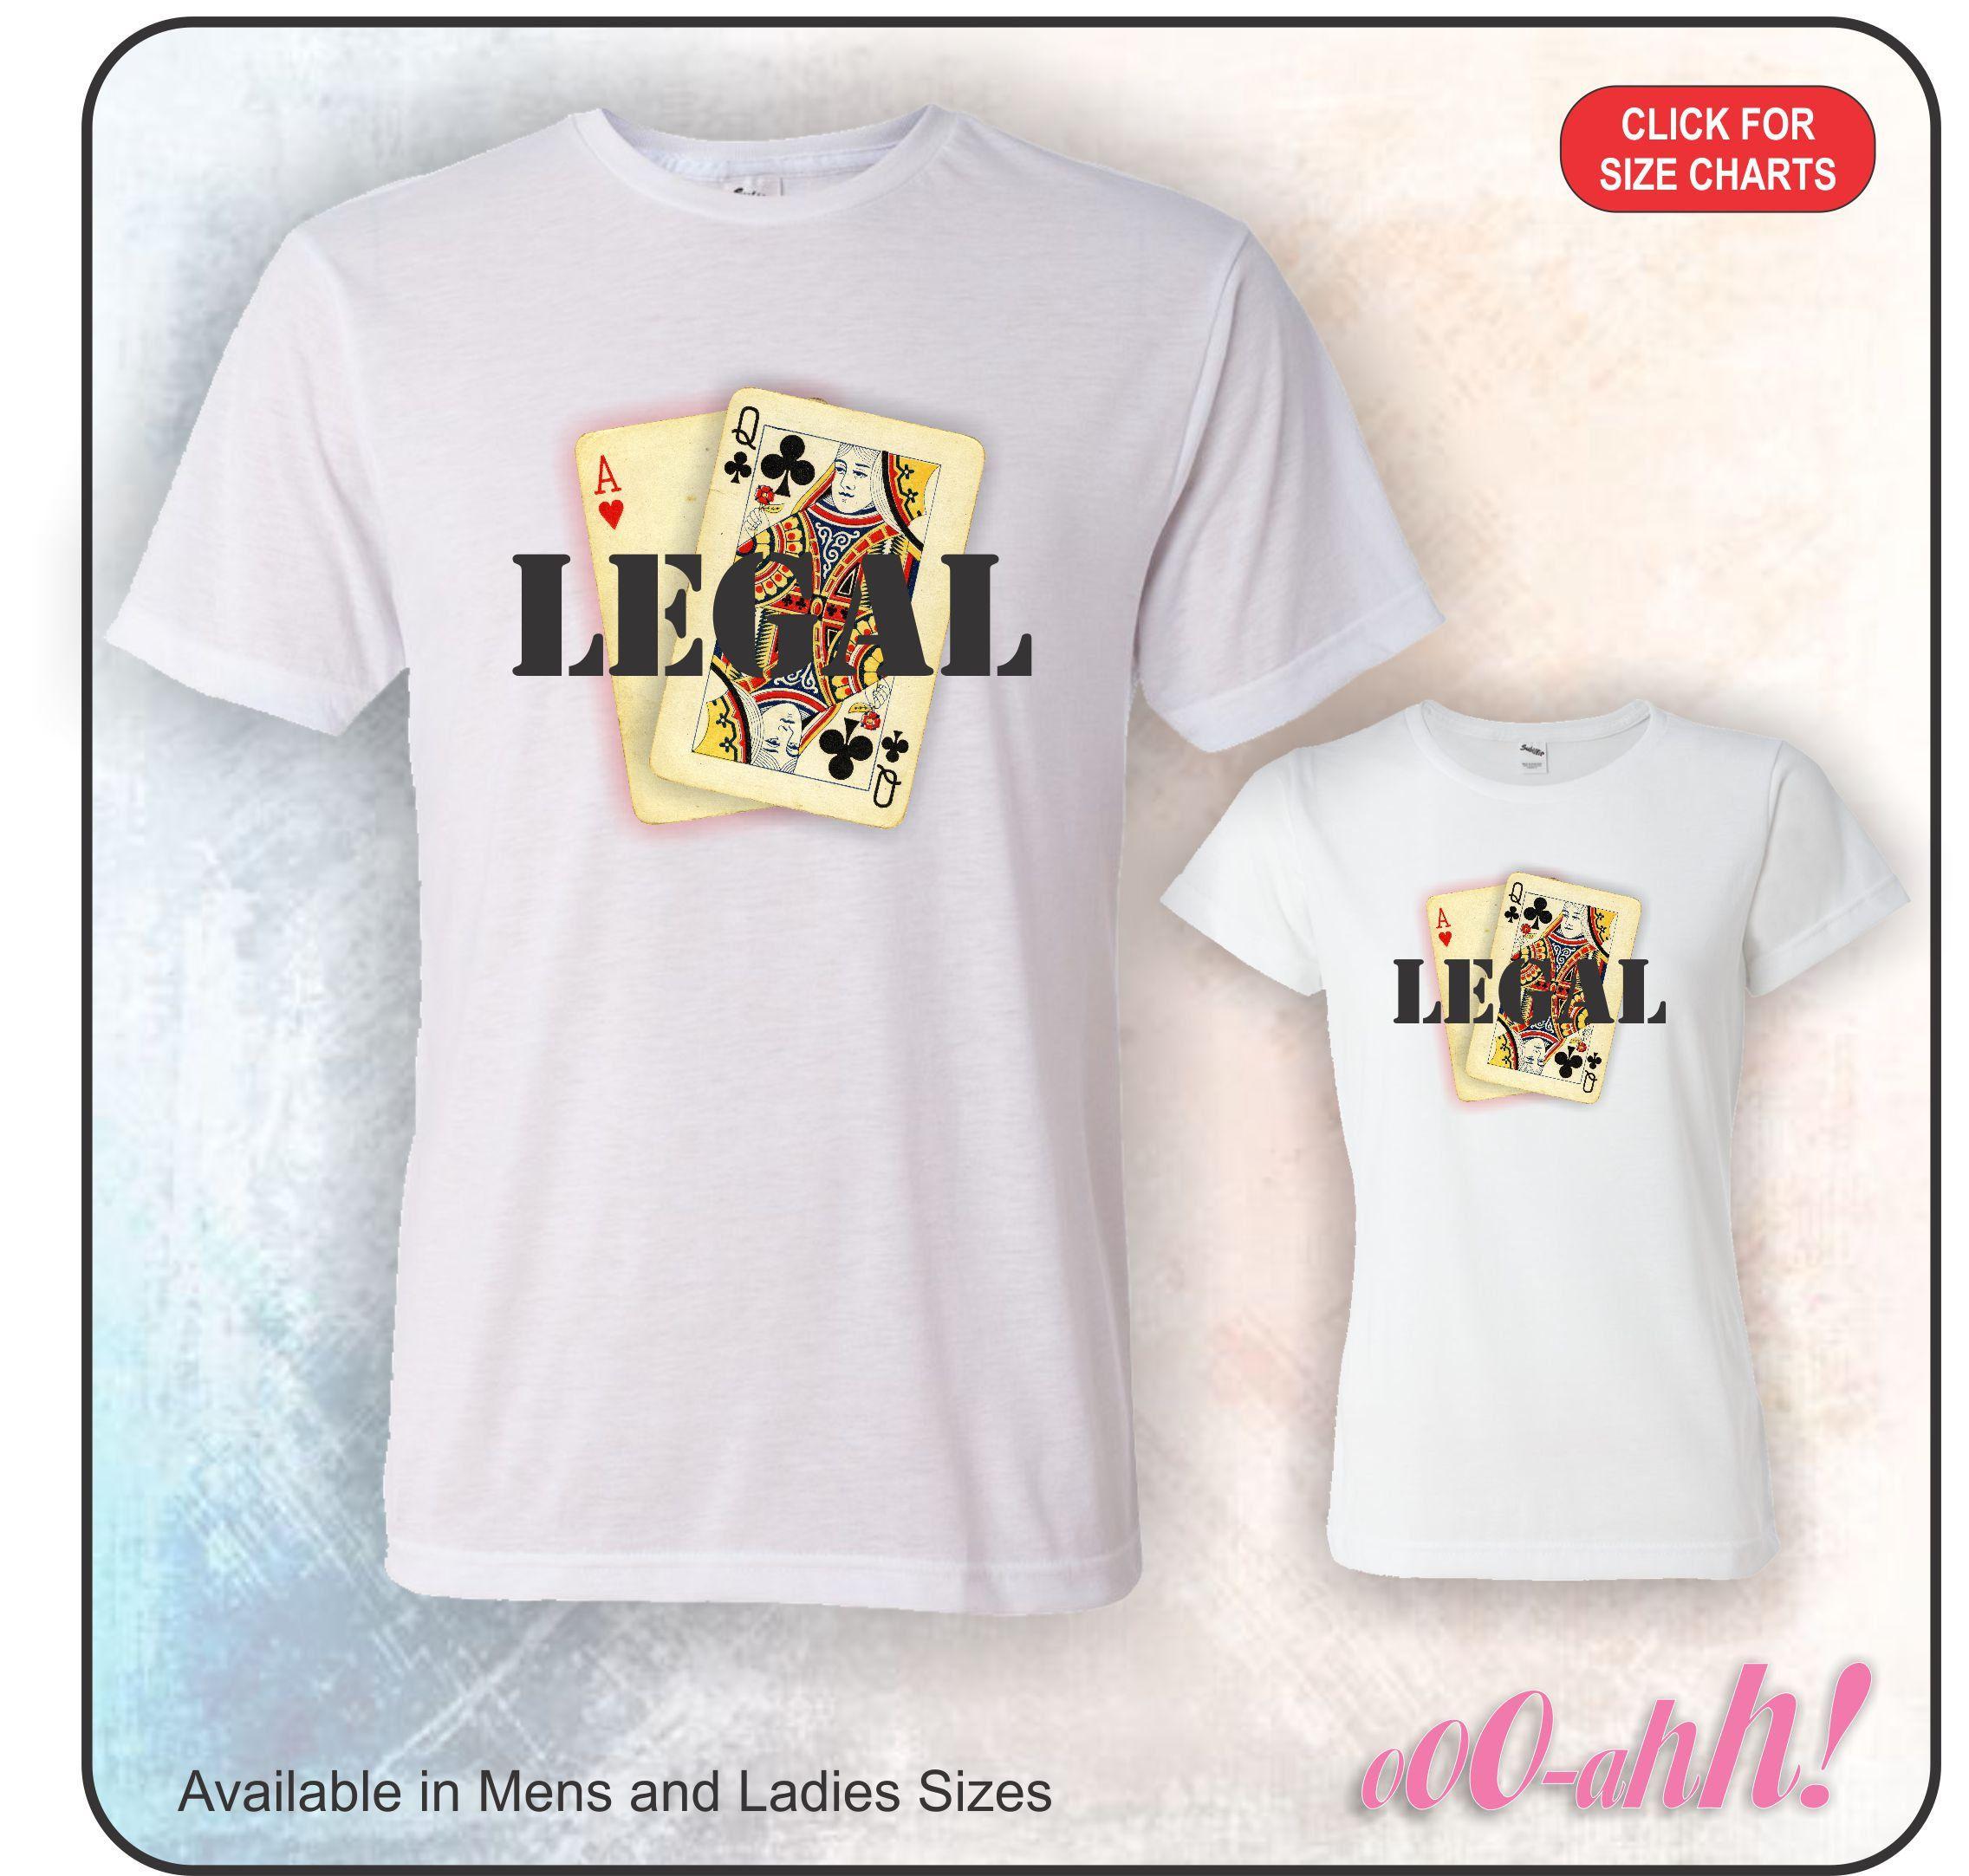 21st birthday legal playing cards funny tshirt full